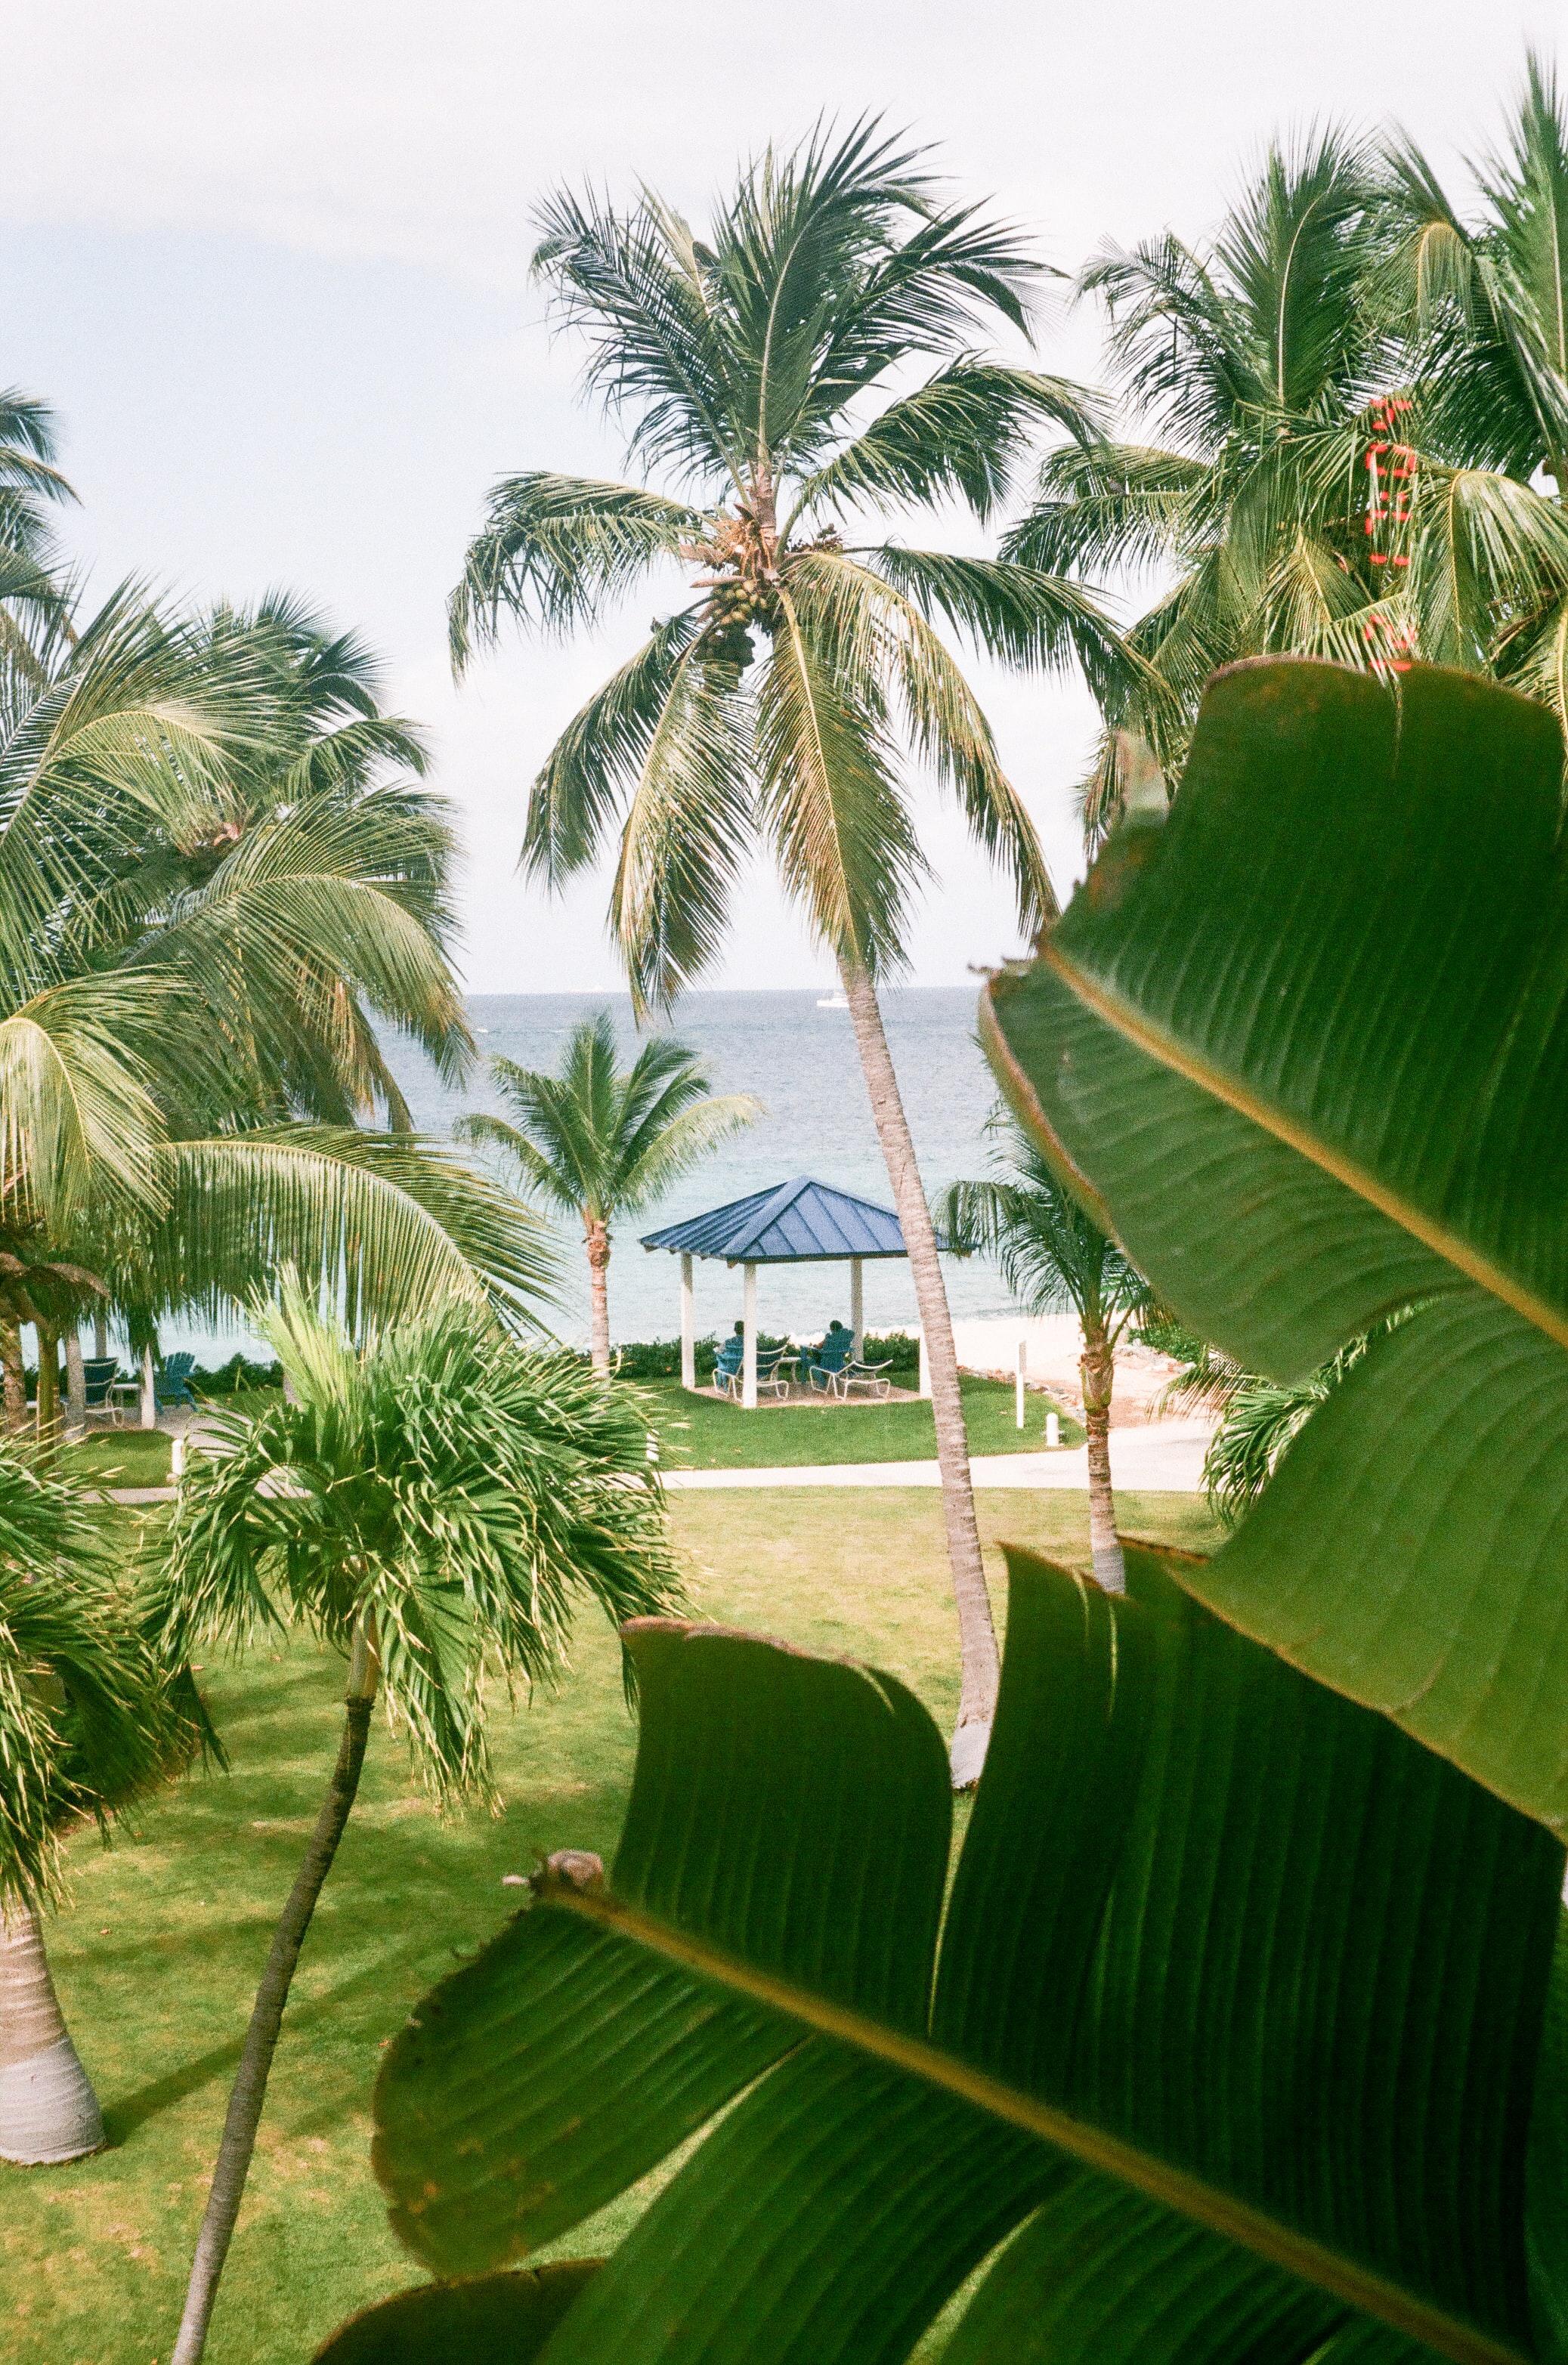 Livingston,-Caribbean-Coast-Lux-Productions